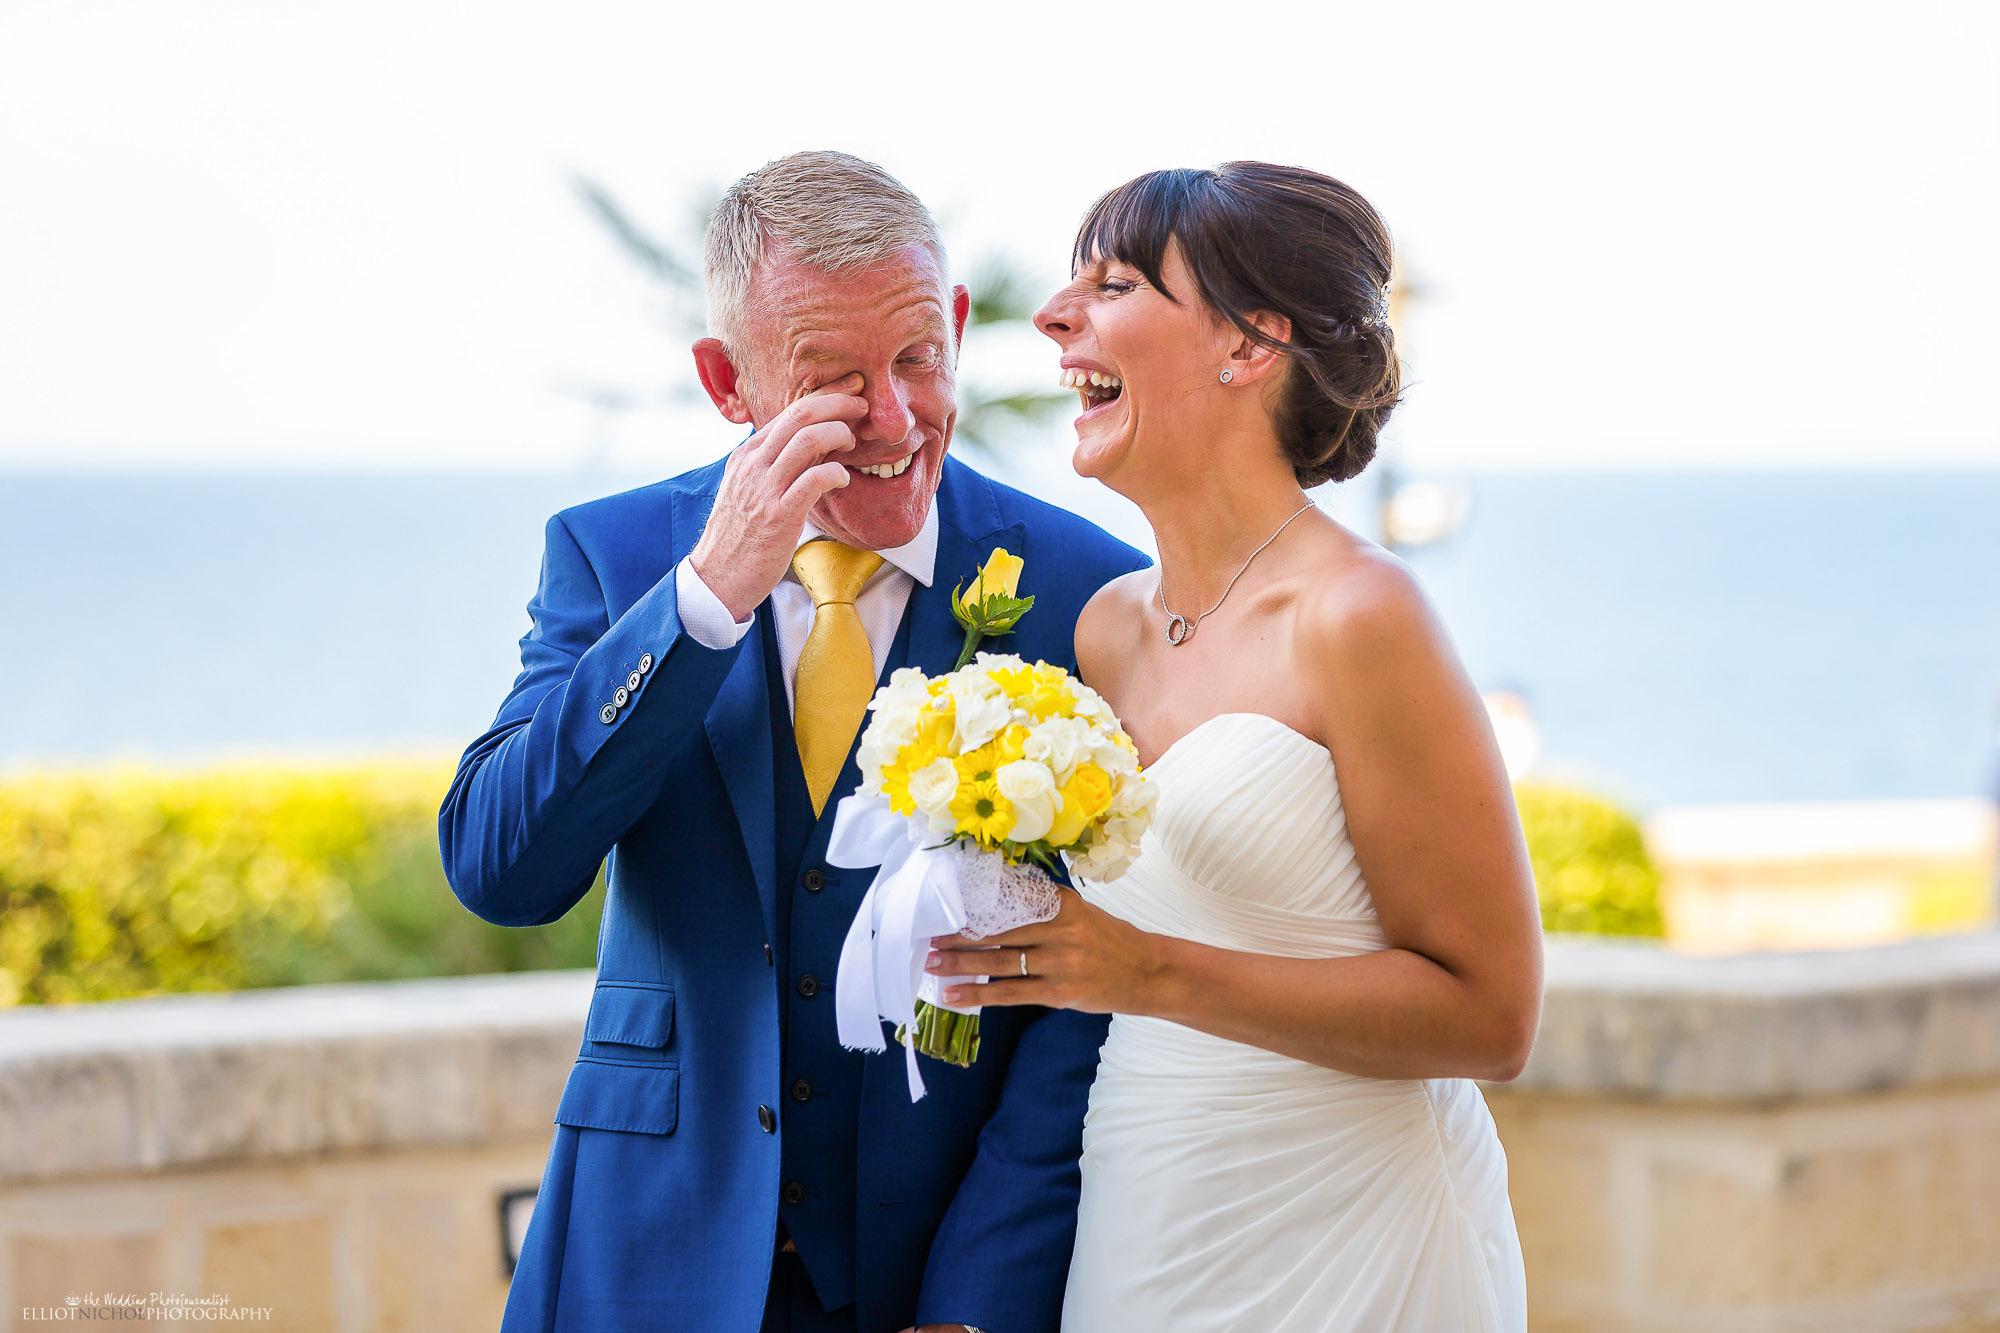 bride-groom-laughing-wedding-day-photo